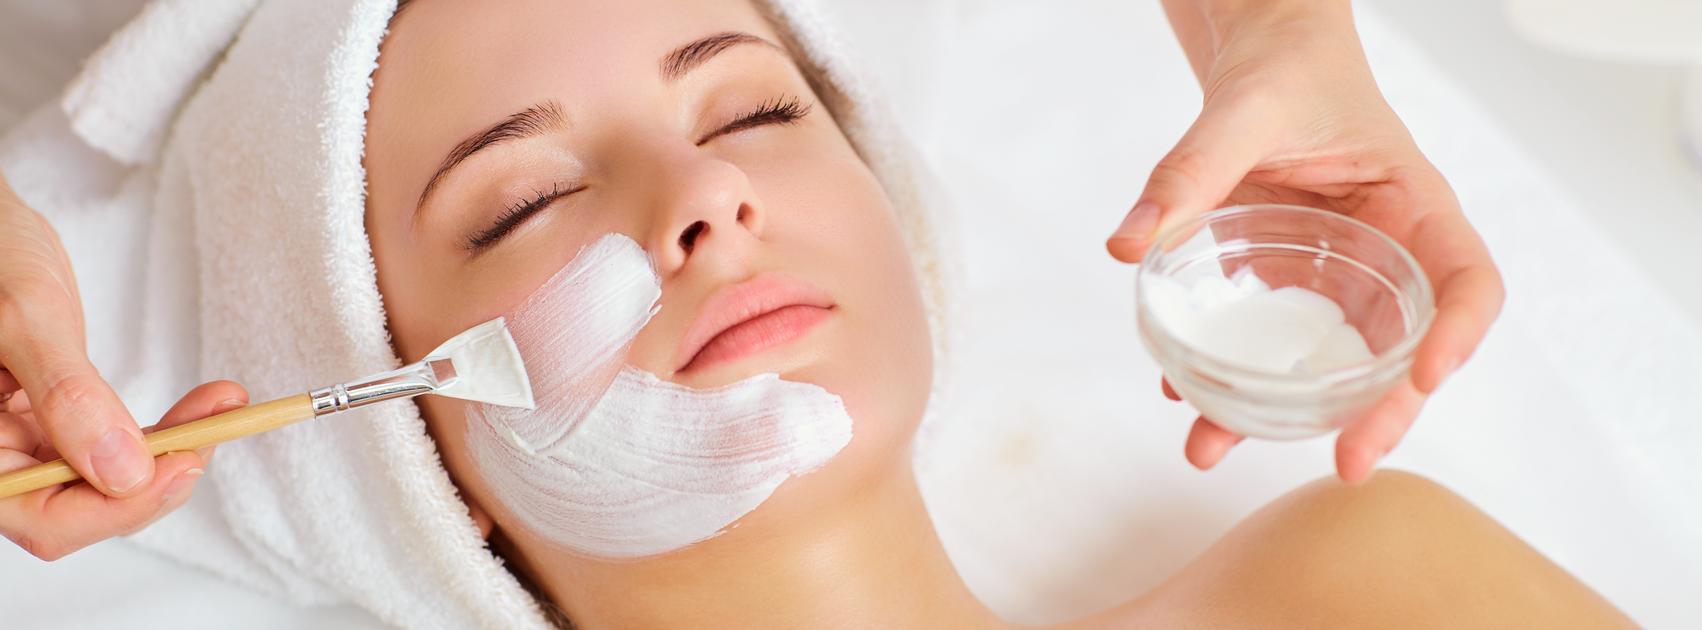 women receiving facial treatment